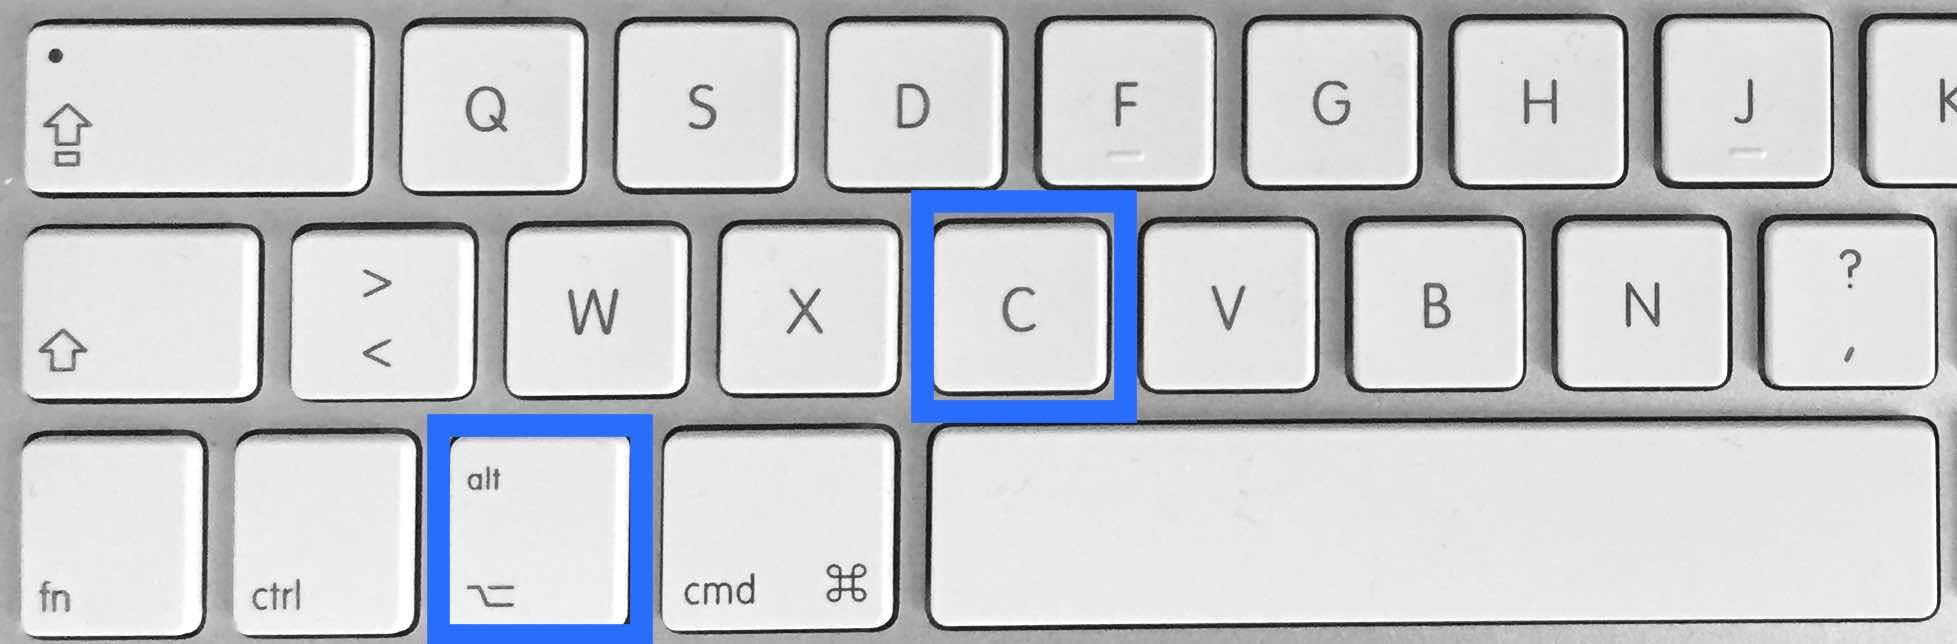 Mac degree symbol choice image symbol and sign ideas copyright symbol shortcut gallery symbol and sign ideas symbol on keyboard copyright symbol on keyboard buycottarizona biocorpaavc